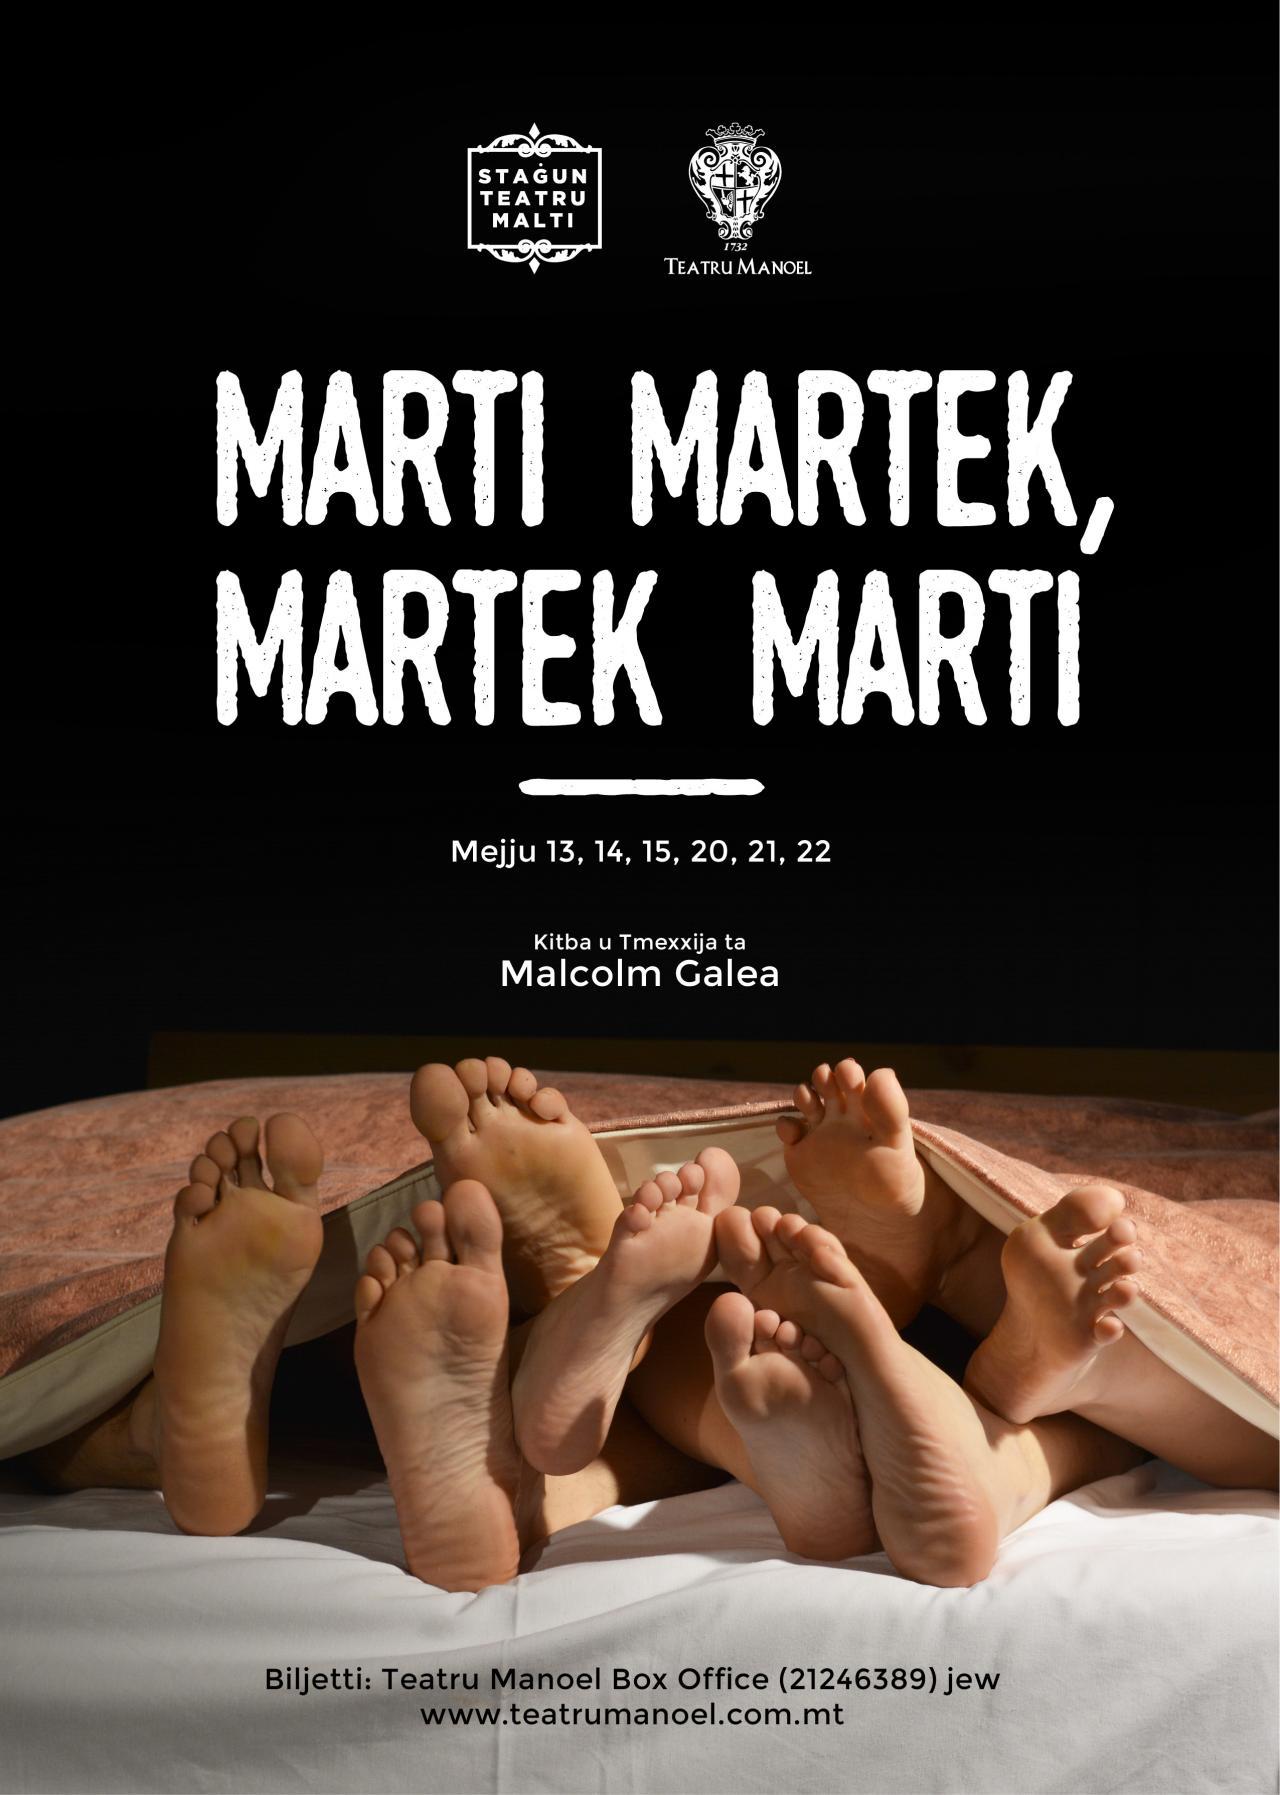 Marti Martek, Martek Marti